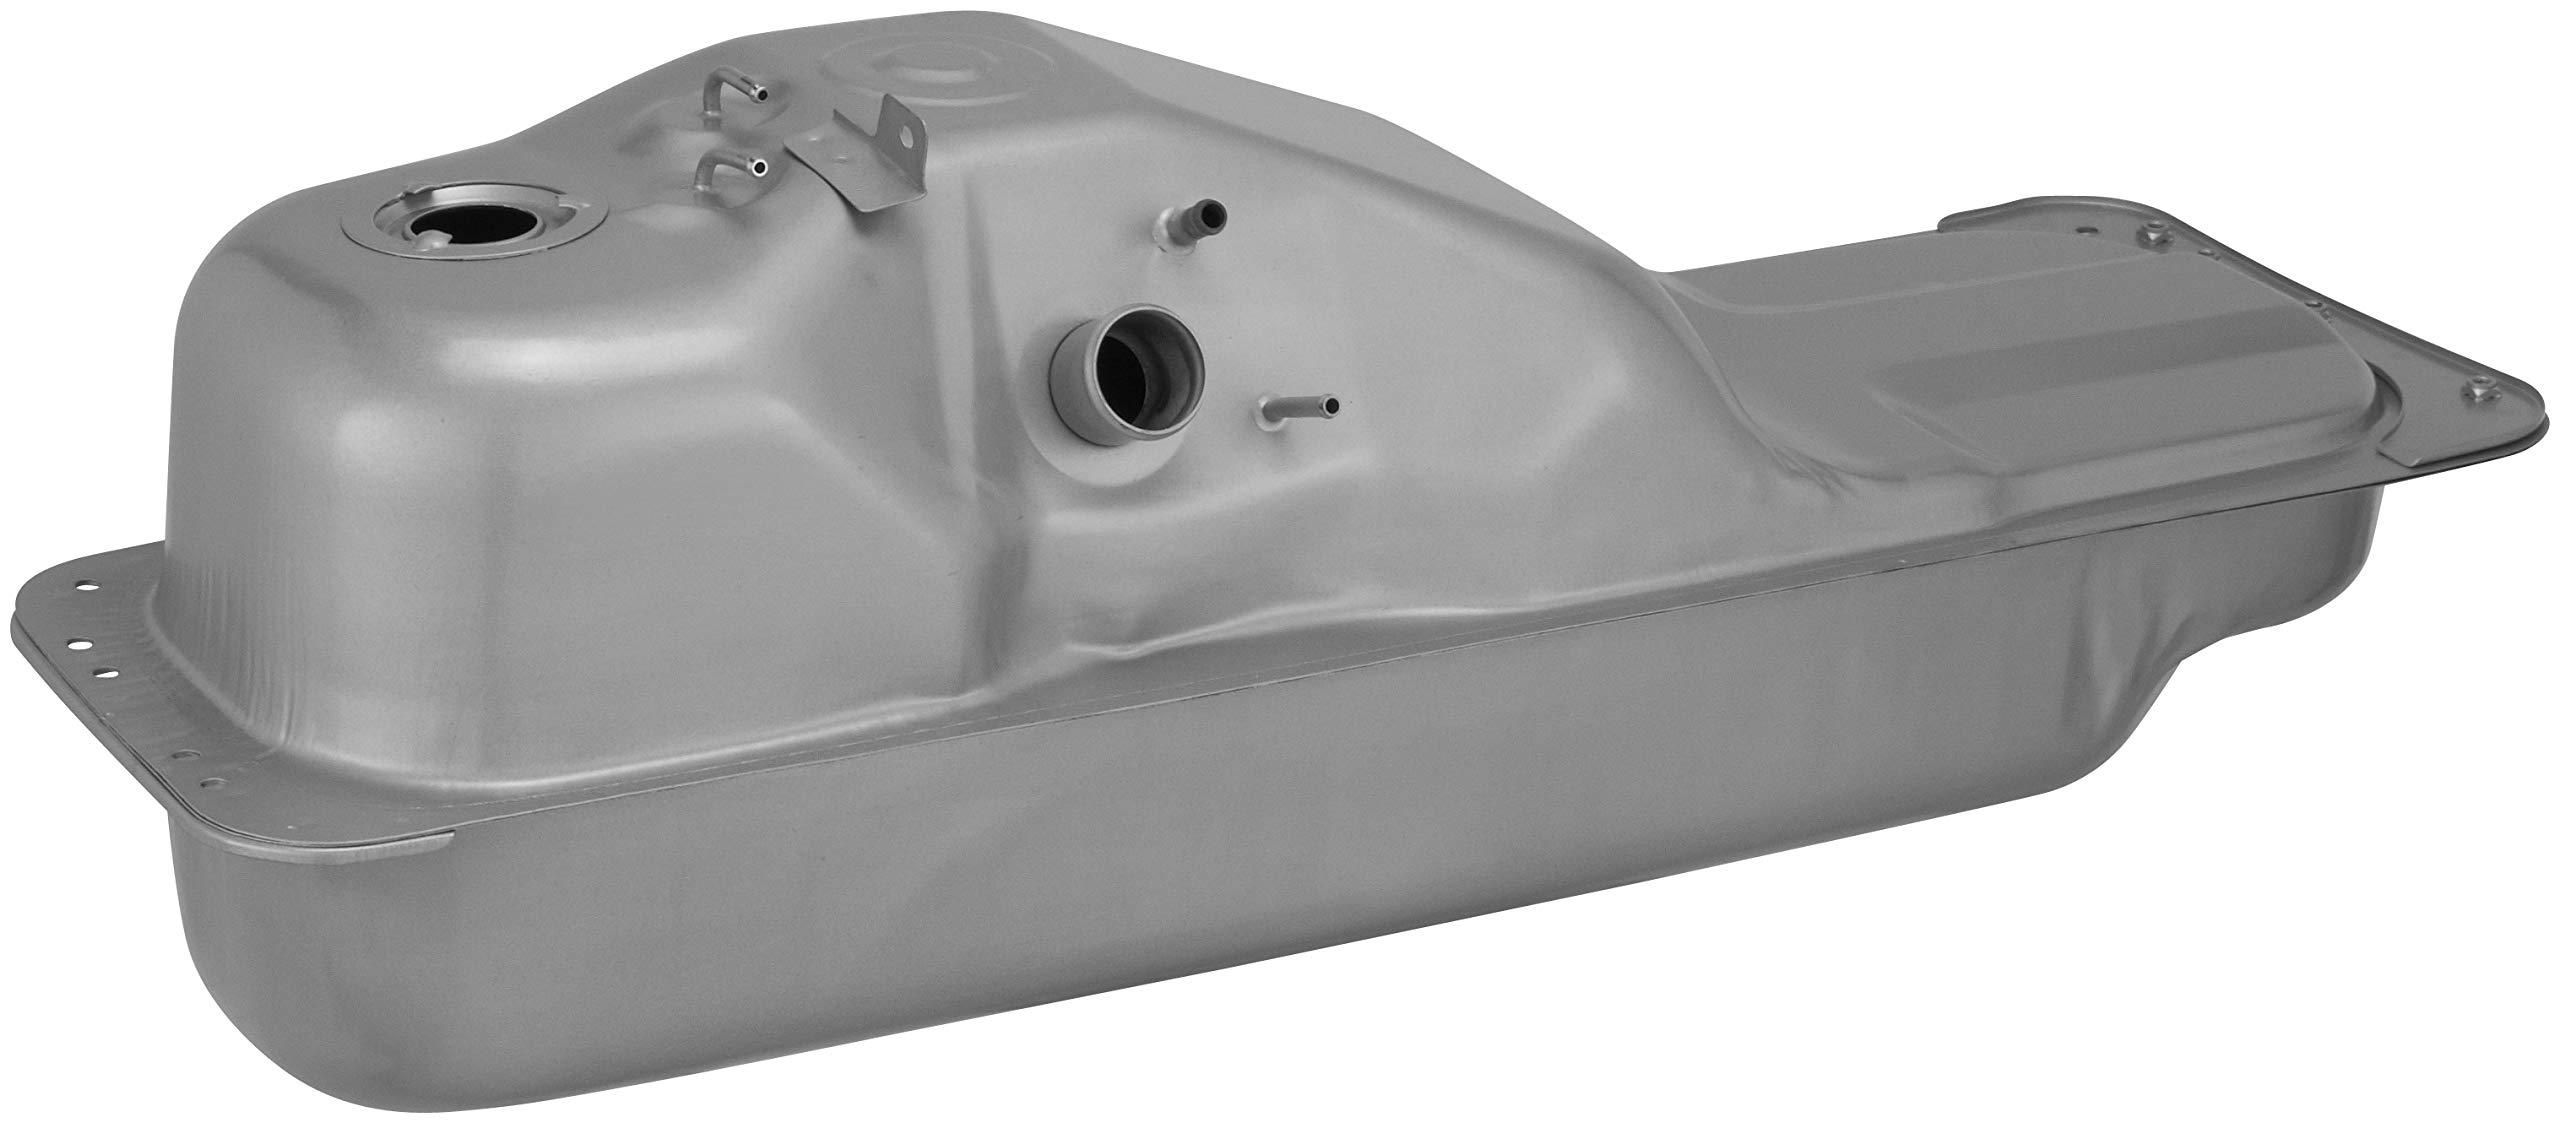 Amazon.com: Spectra Premium NS11B Fuel Tank for Nissan Pickup: AutomotiveAmazon.com